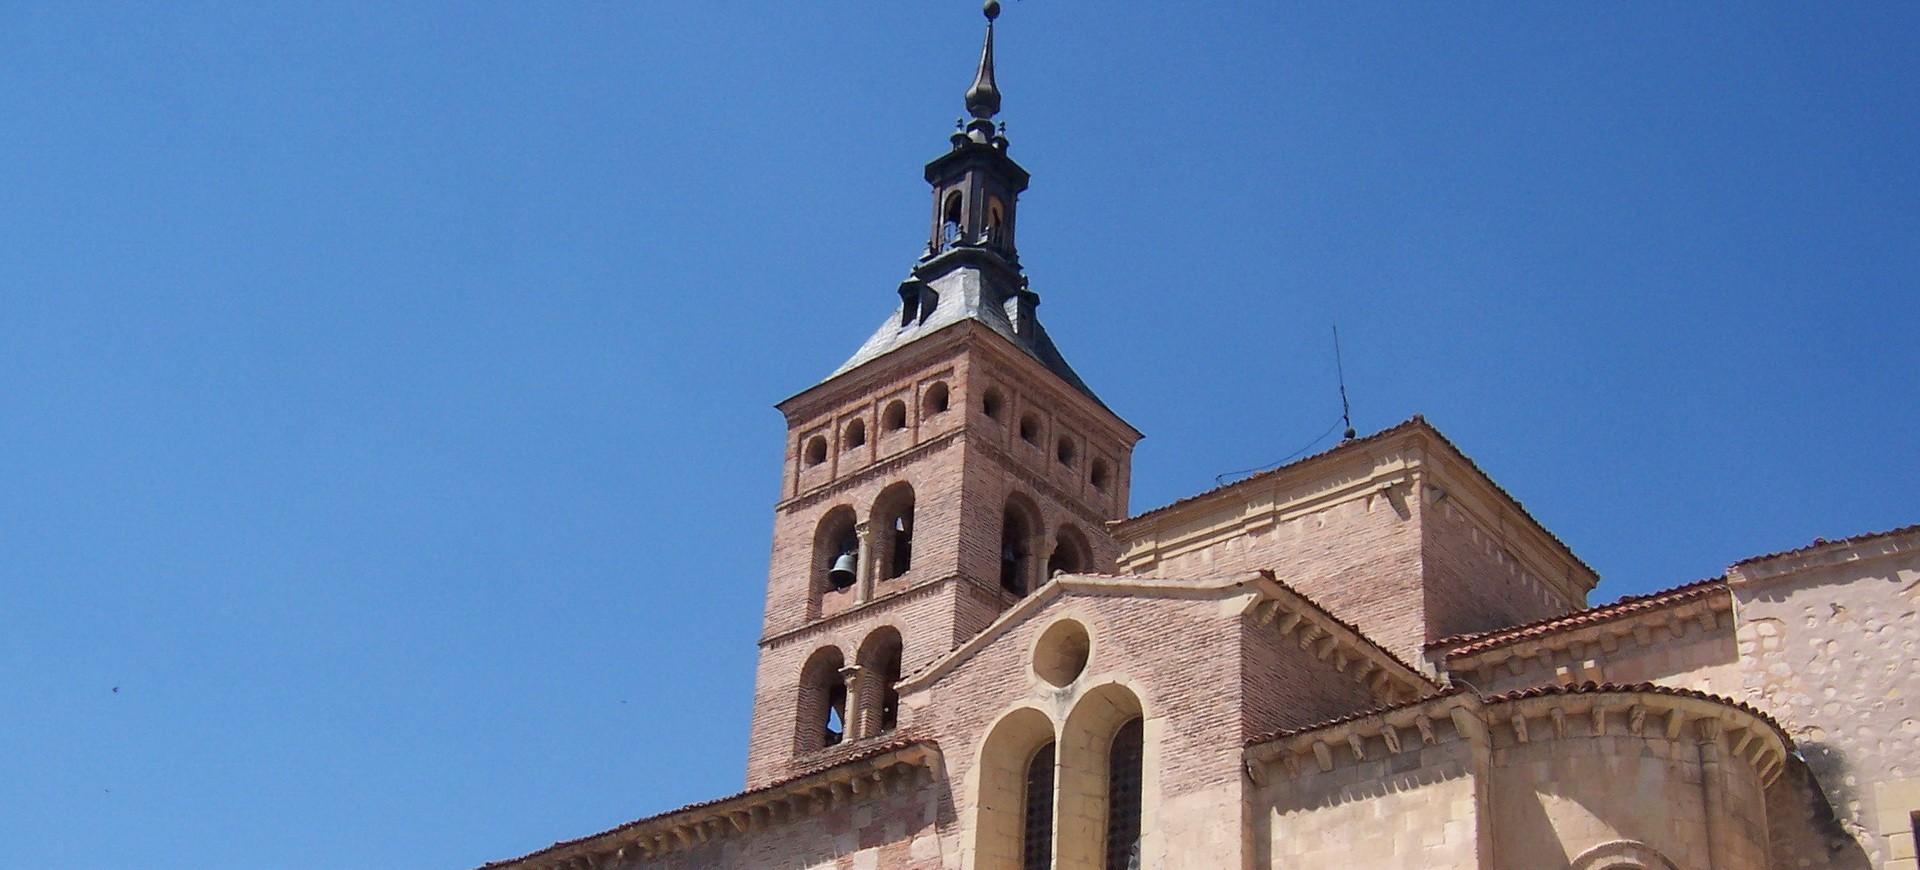 Castille en Espagne